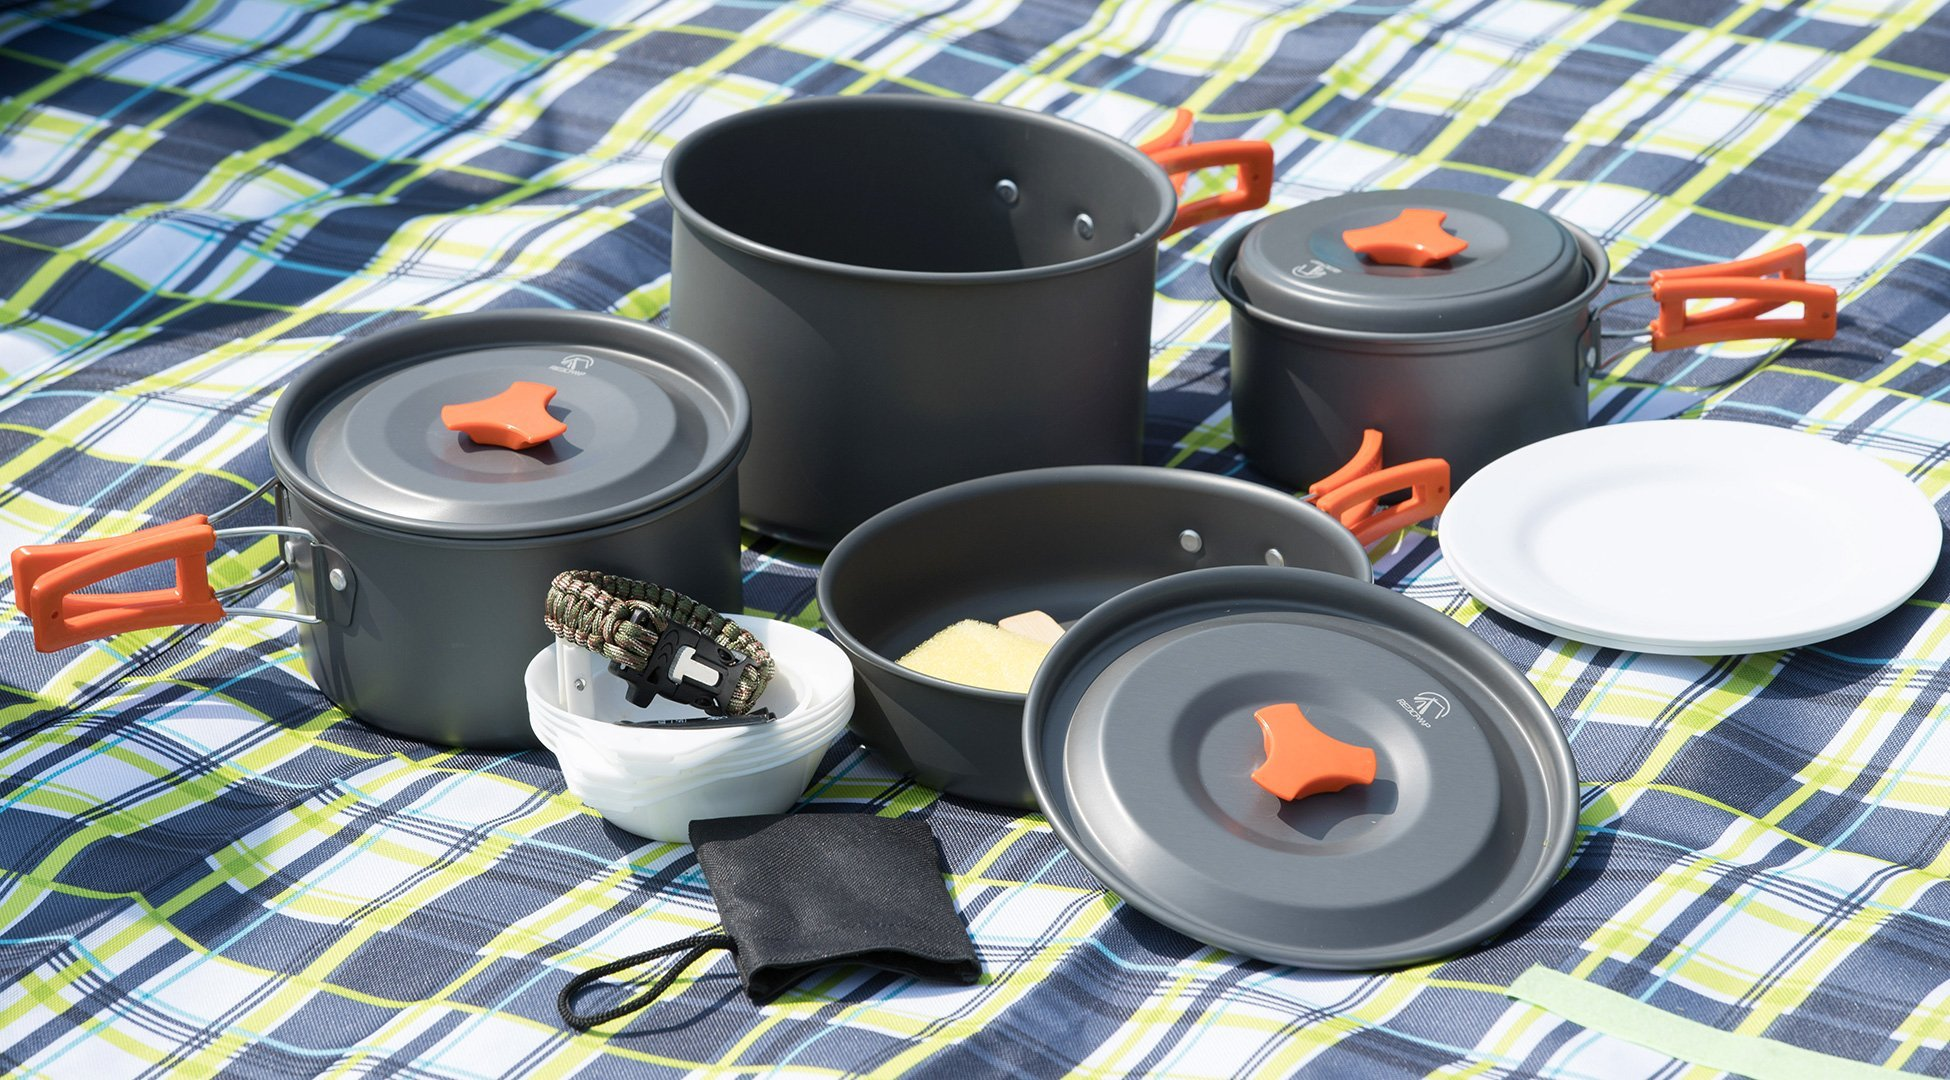 23-piece camping cookware set